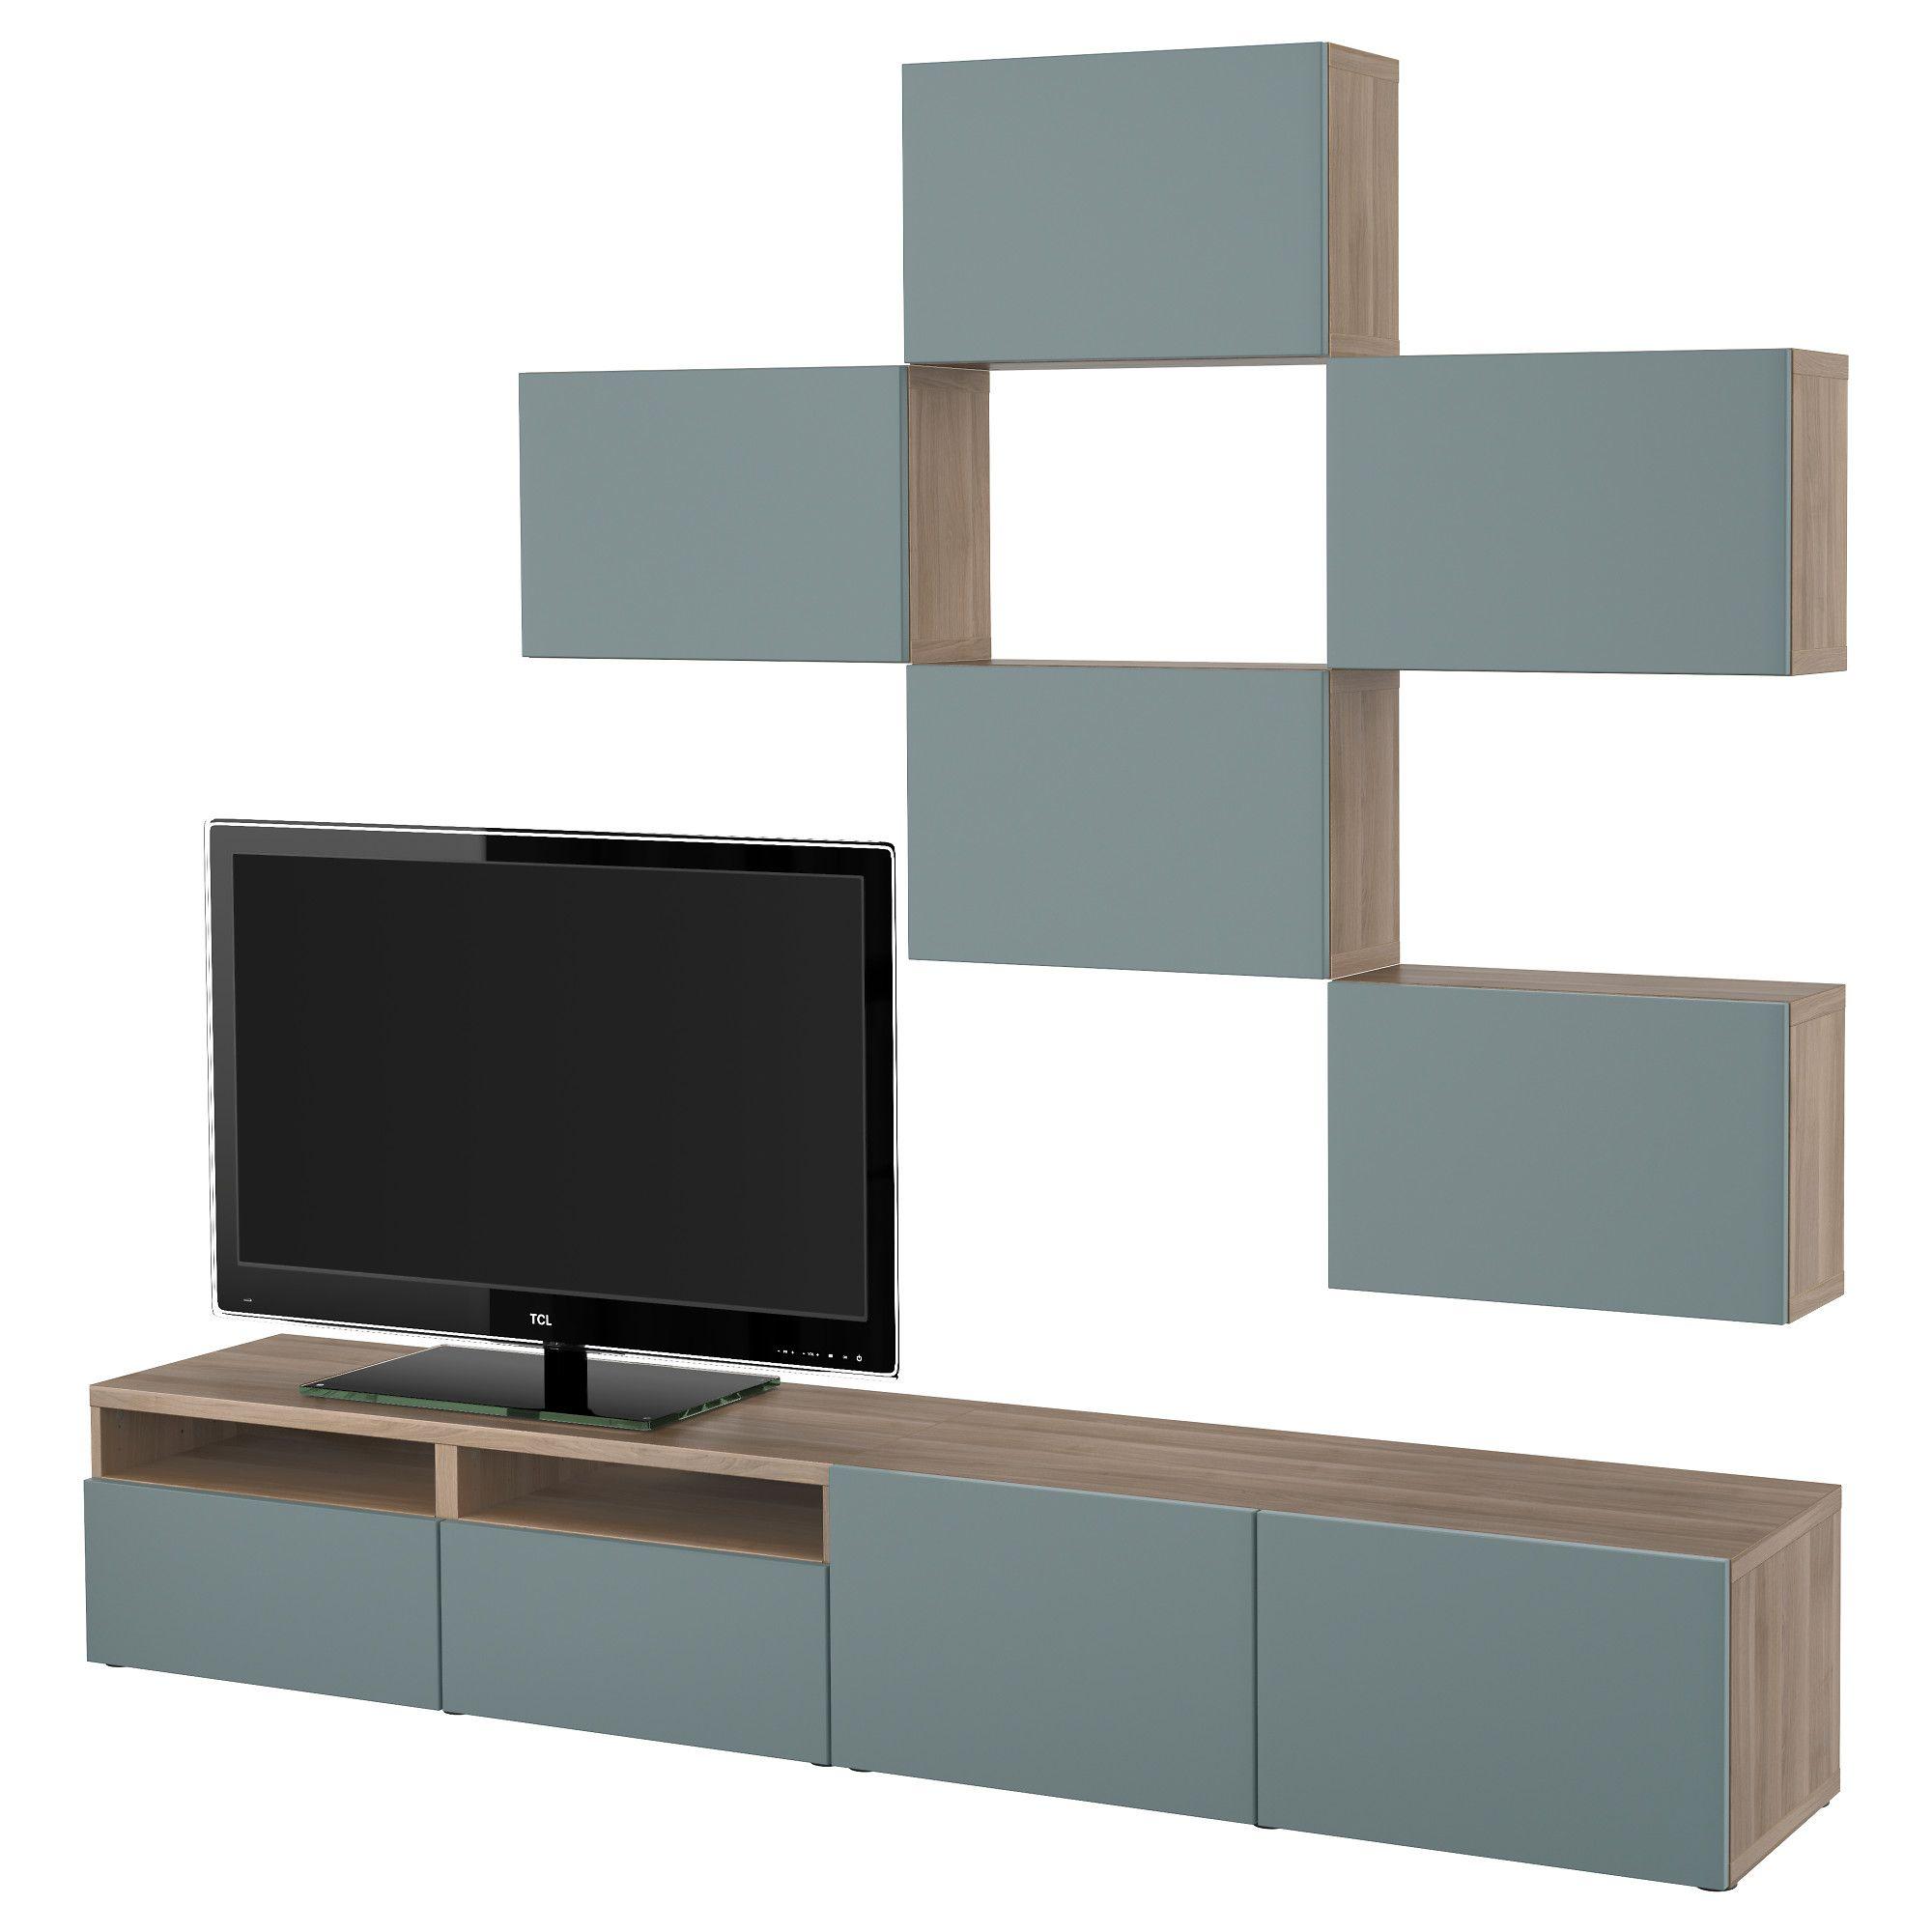 pin by ladendirekt on tv hifi m bel pinterest tv storage dark brown sofas and ikea. Black Bedroom Furniture Sets. Home Design Ideas